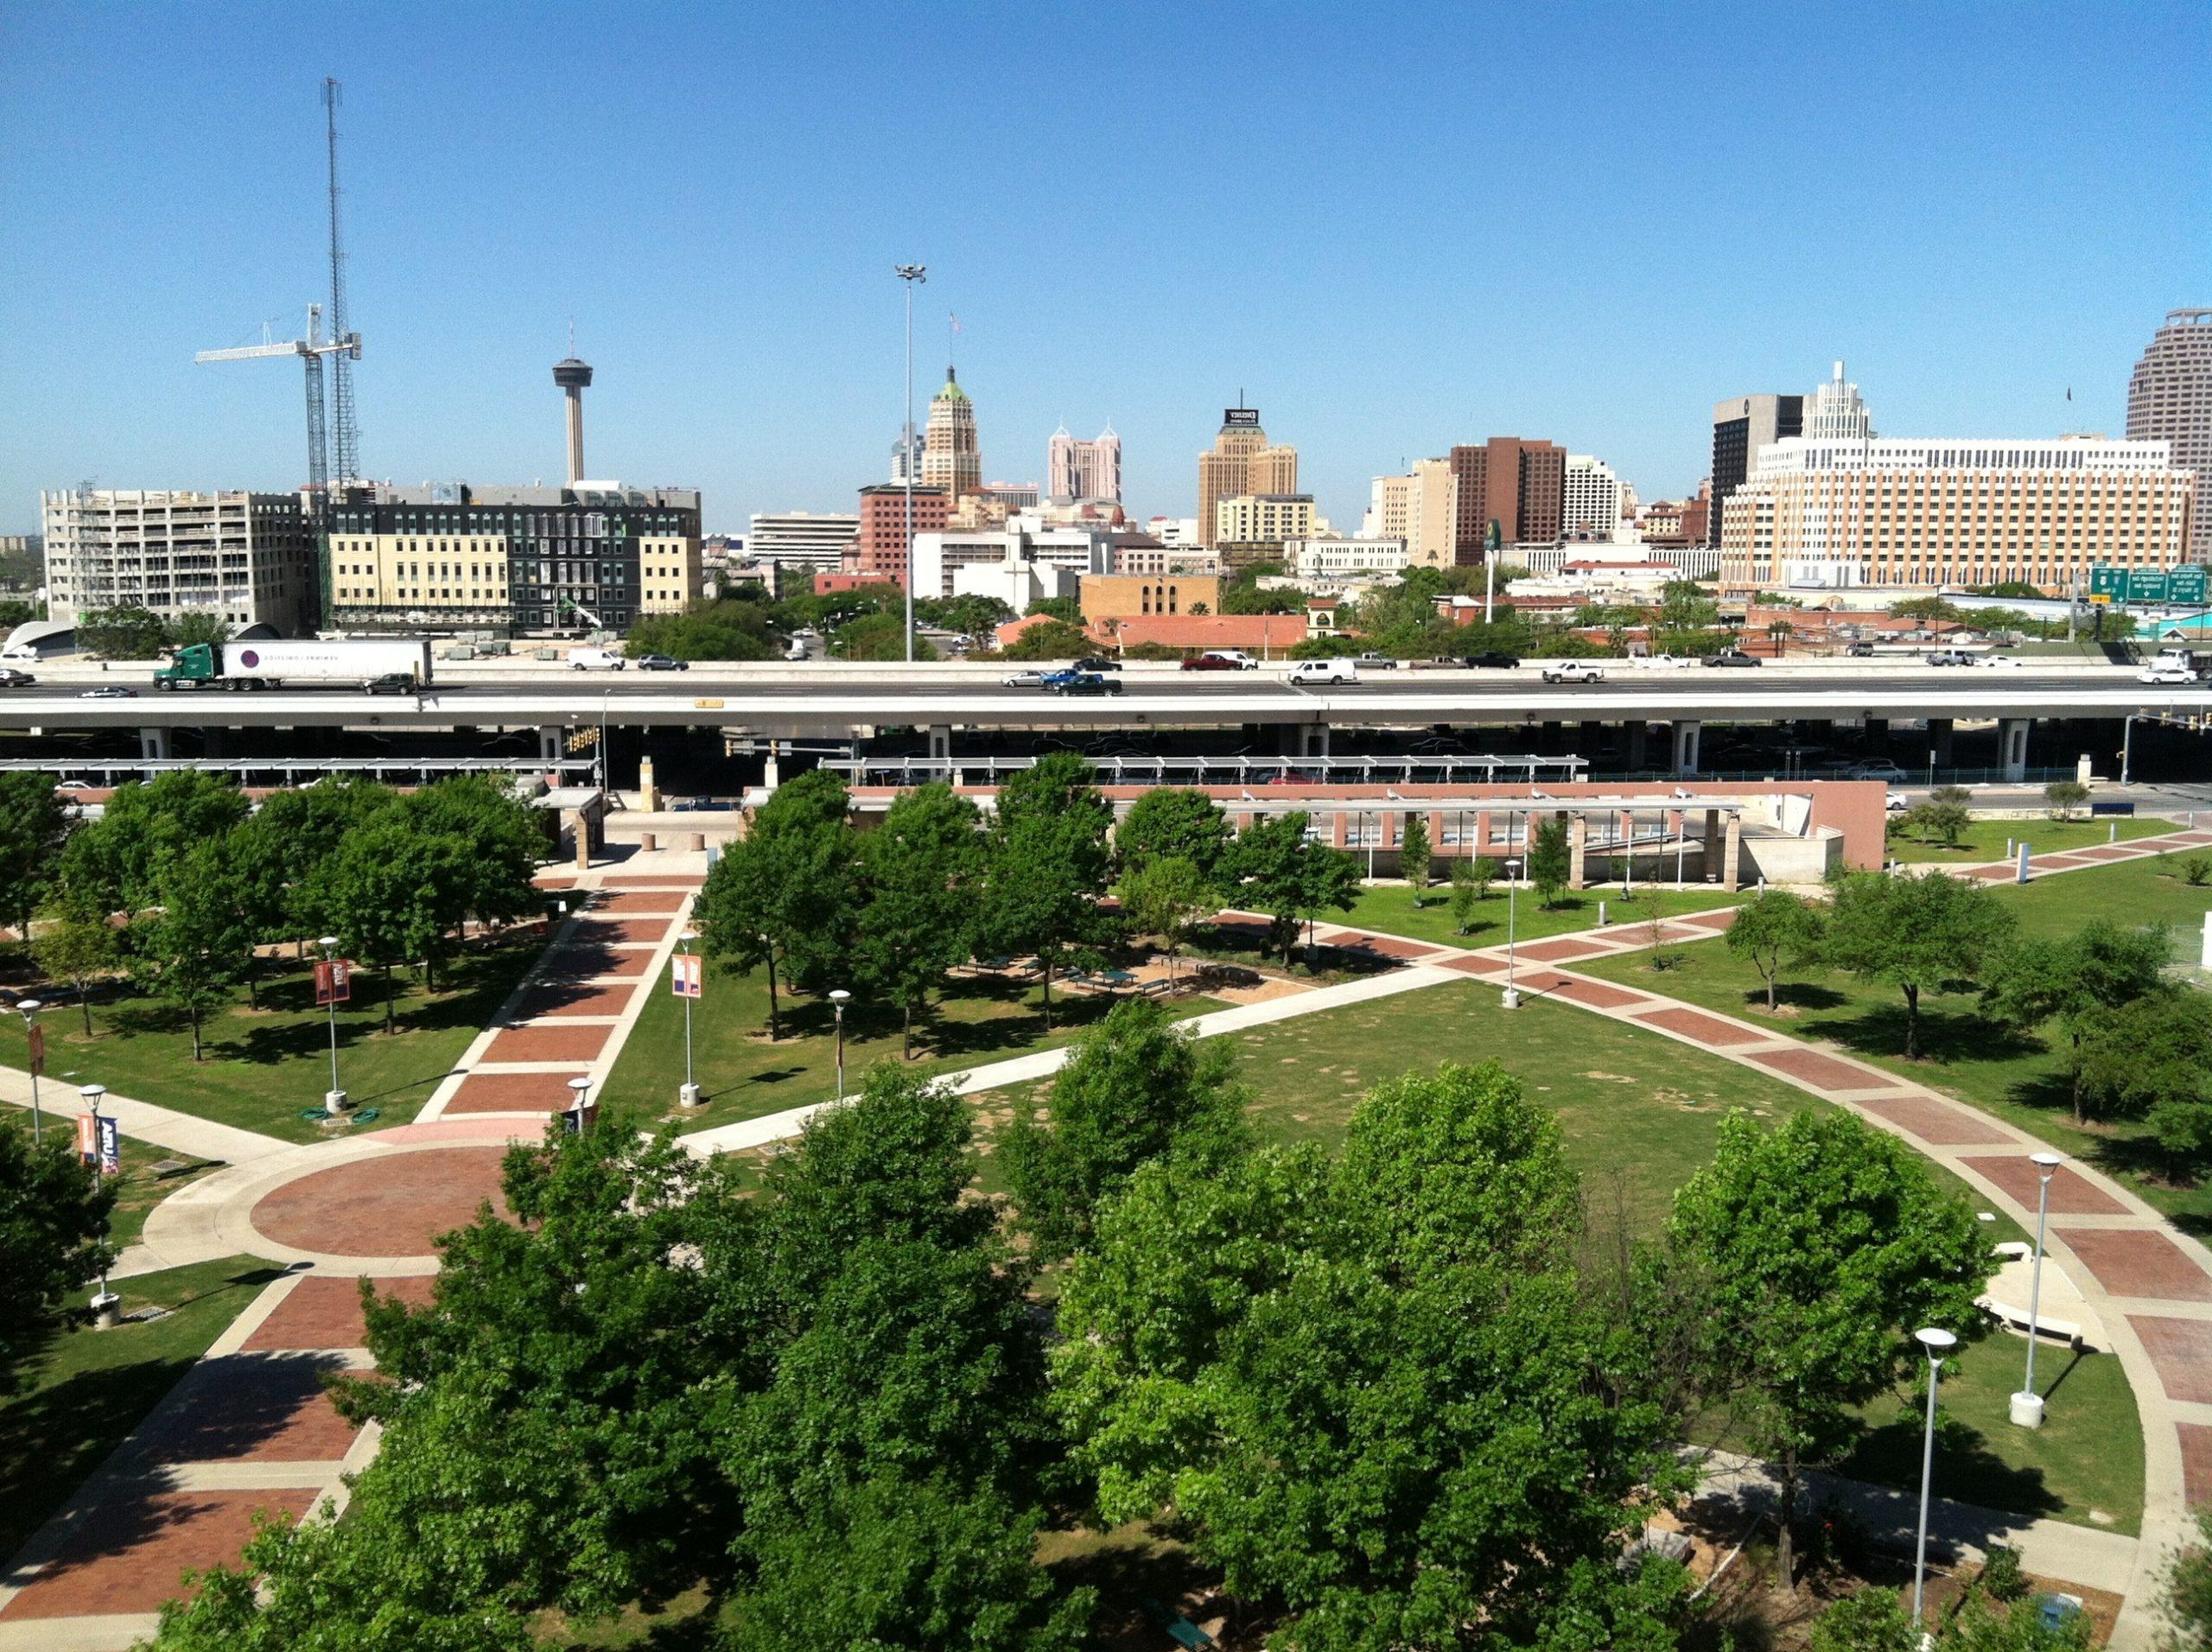 San Antonio as seen from UTSA's Downtown campus. (Photo by Thomas Tunstall)